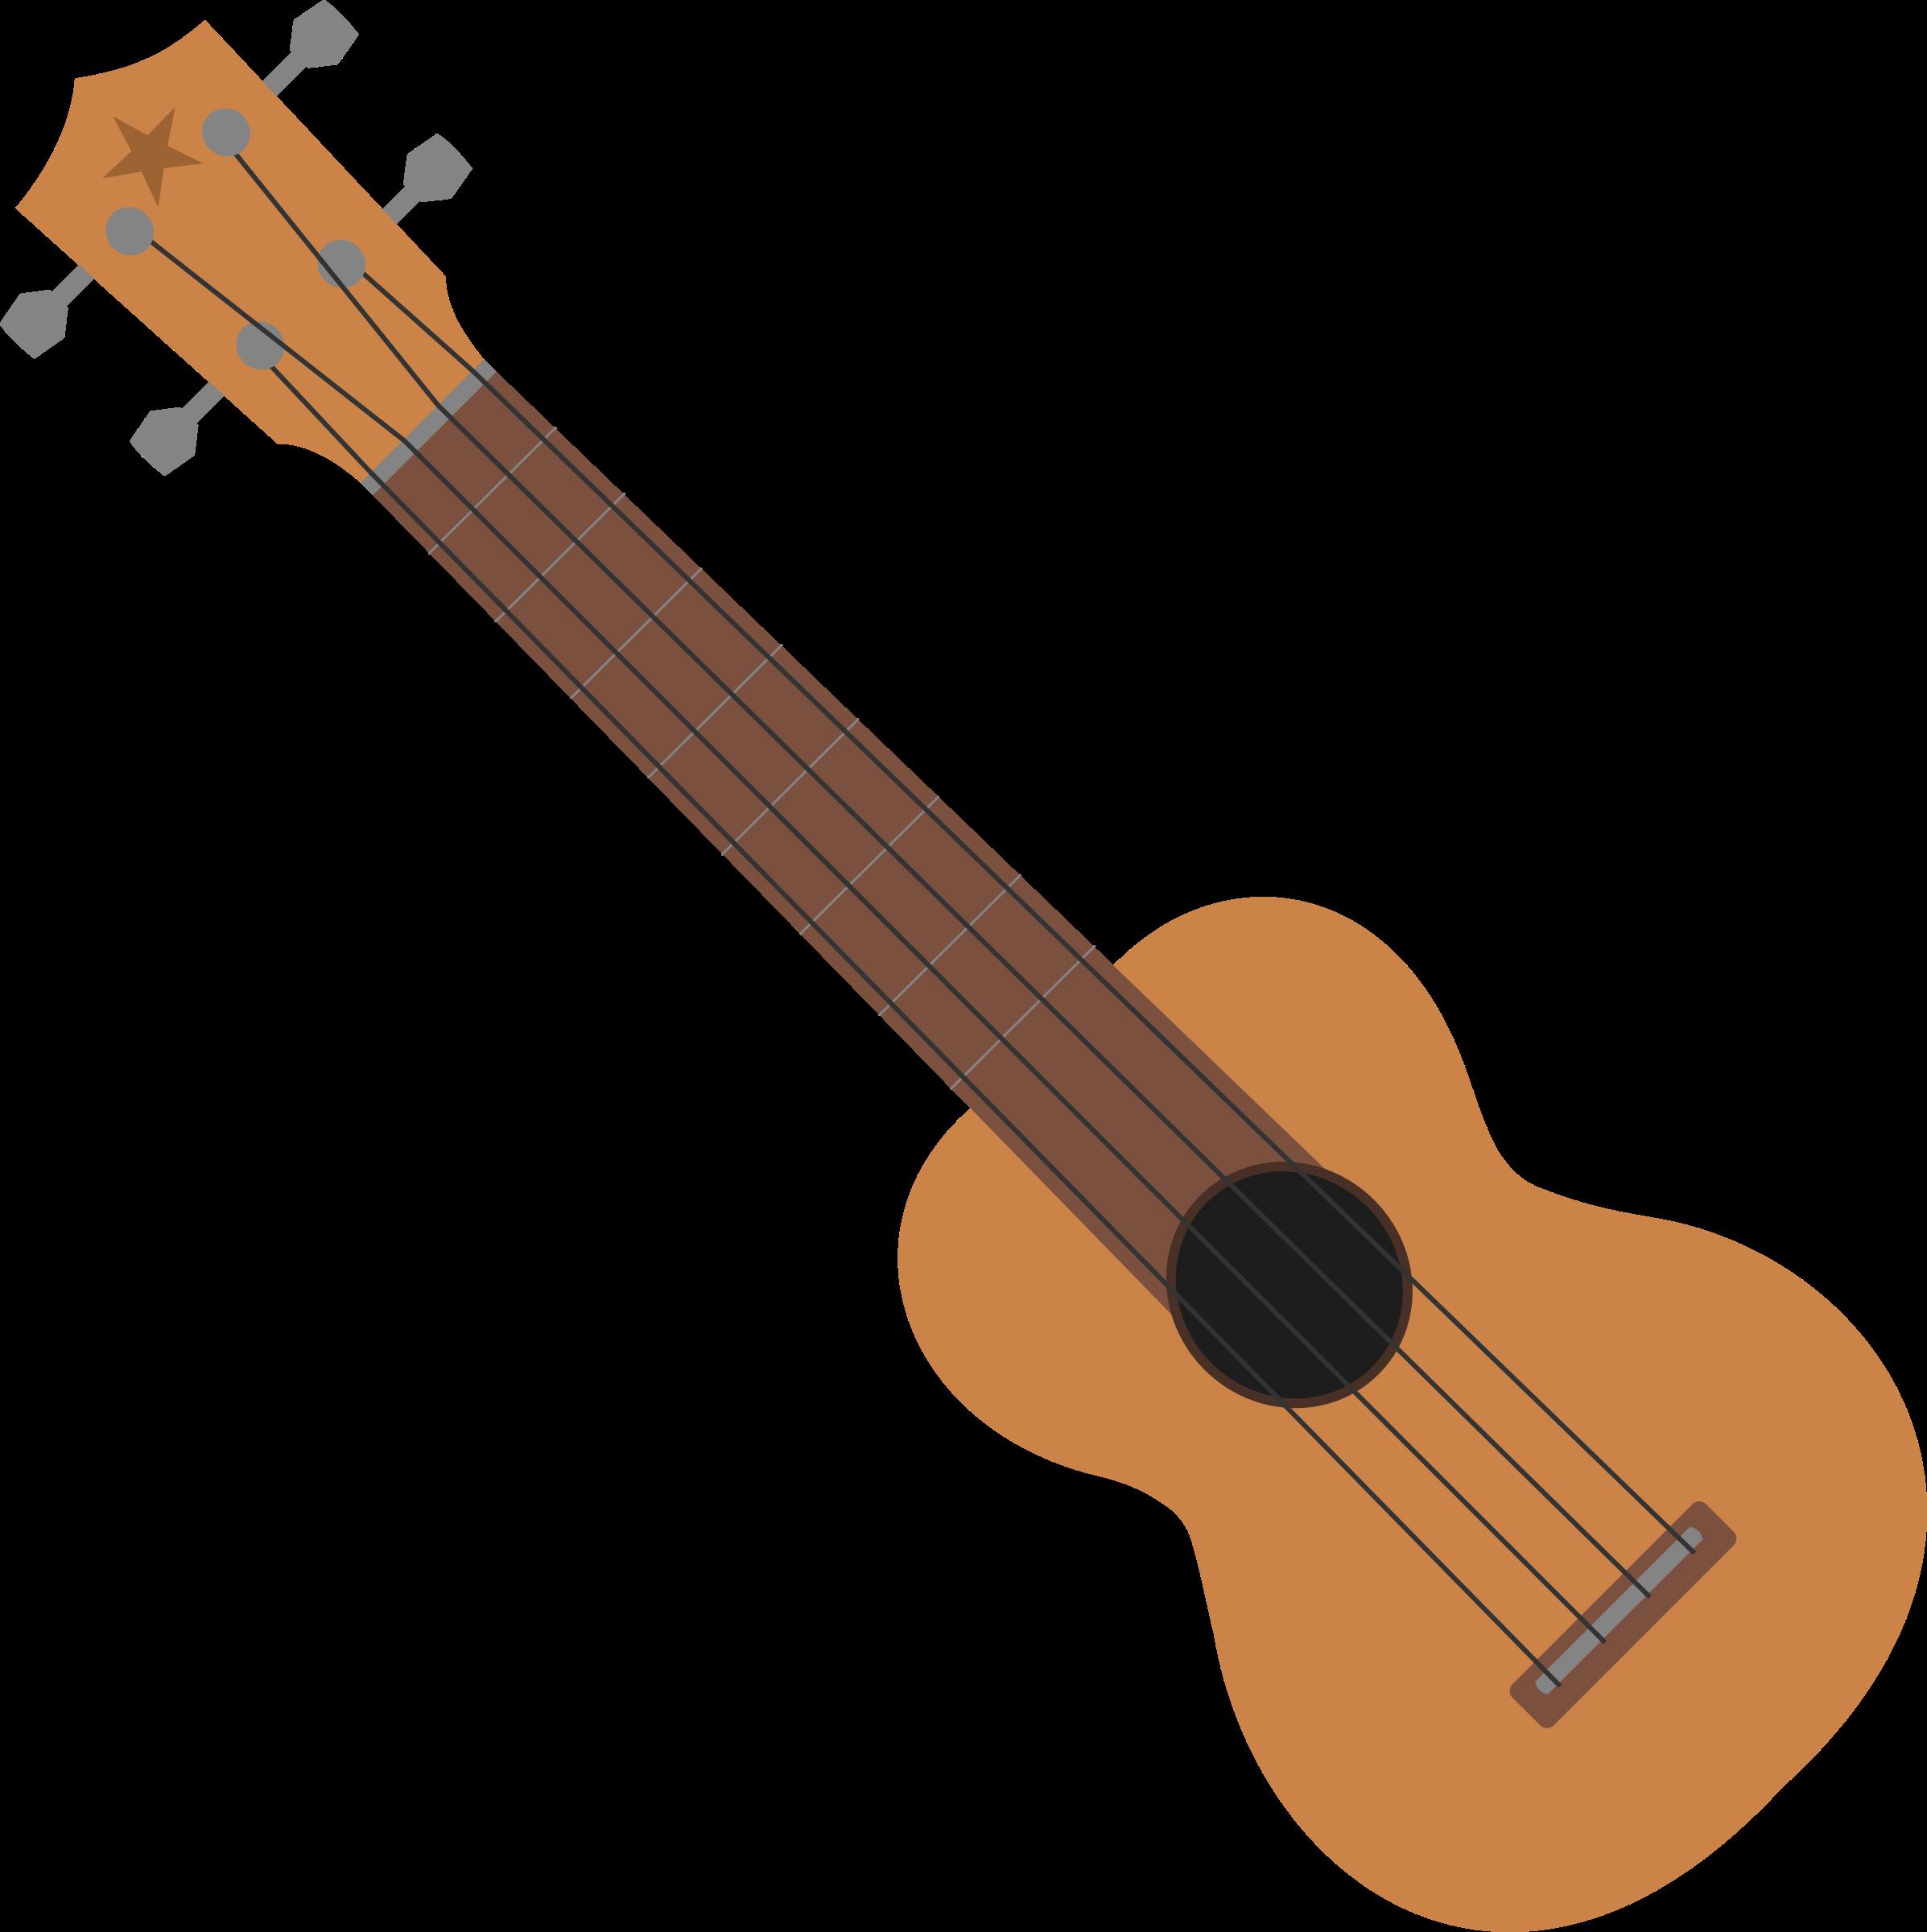 Clipart guitar ukelele. Simple ukulele no outline